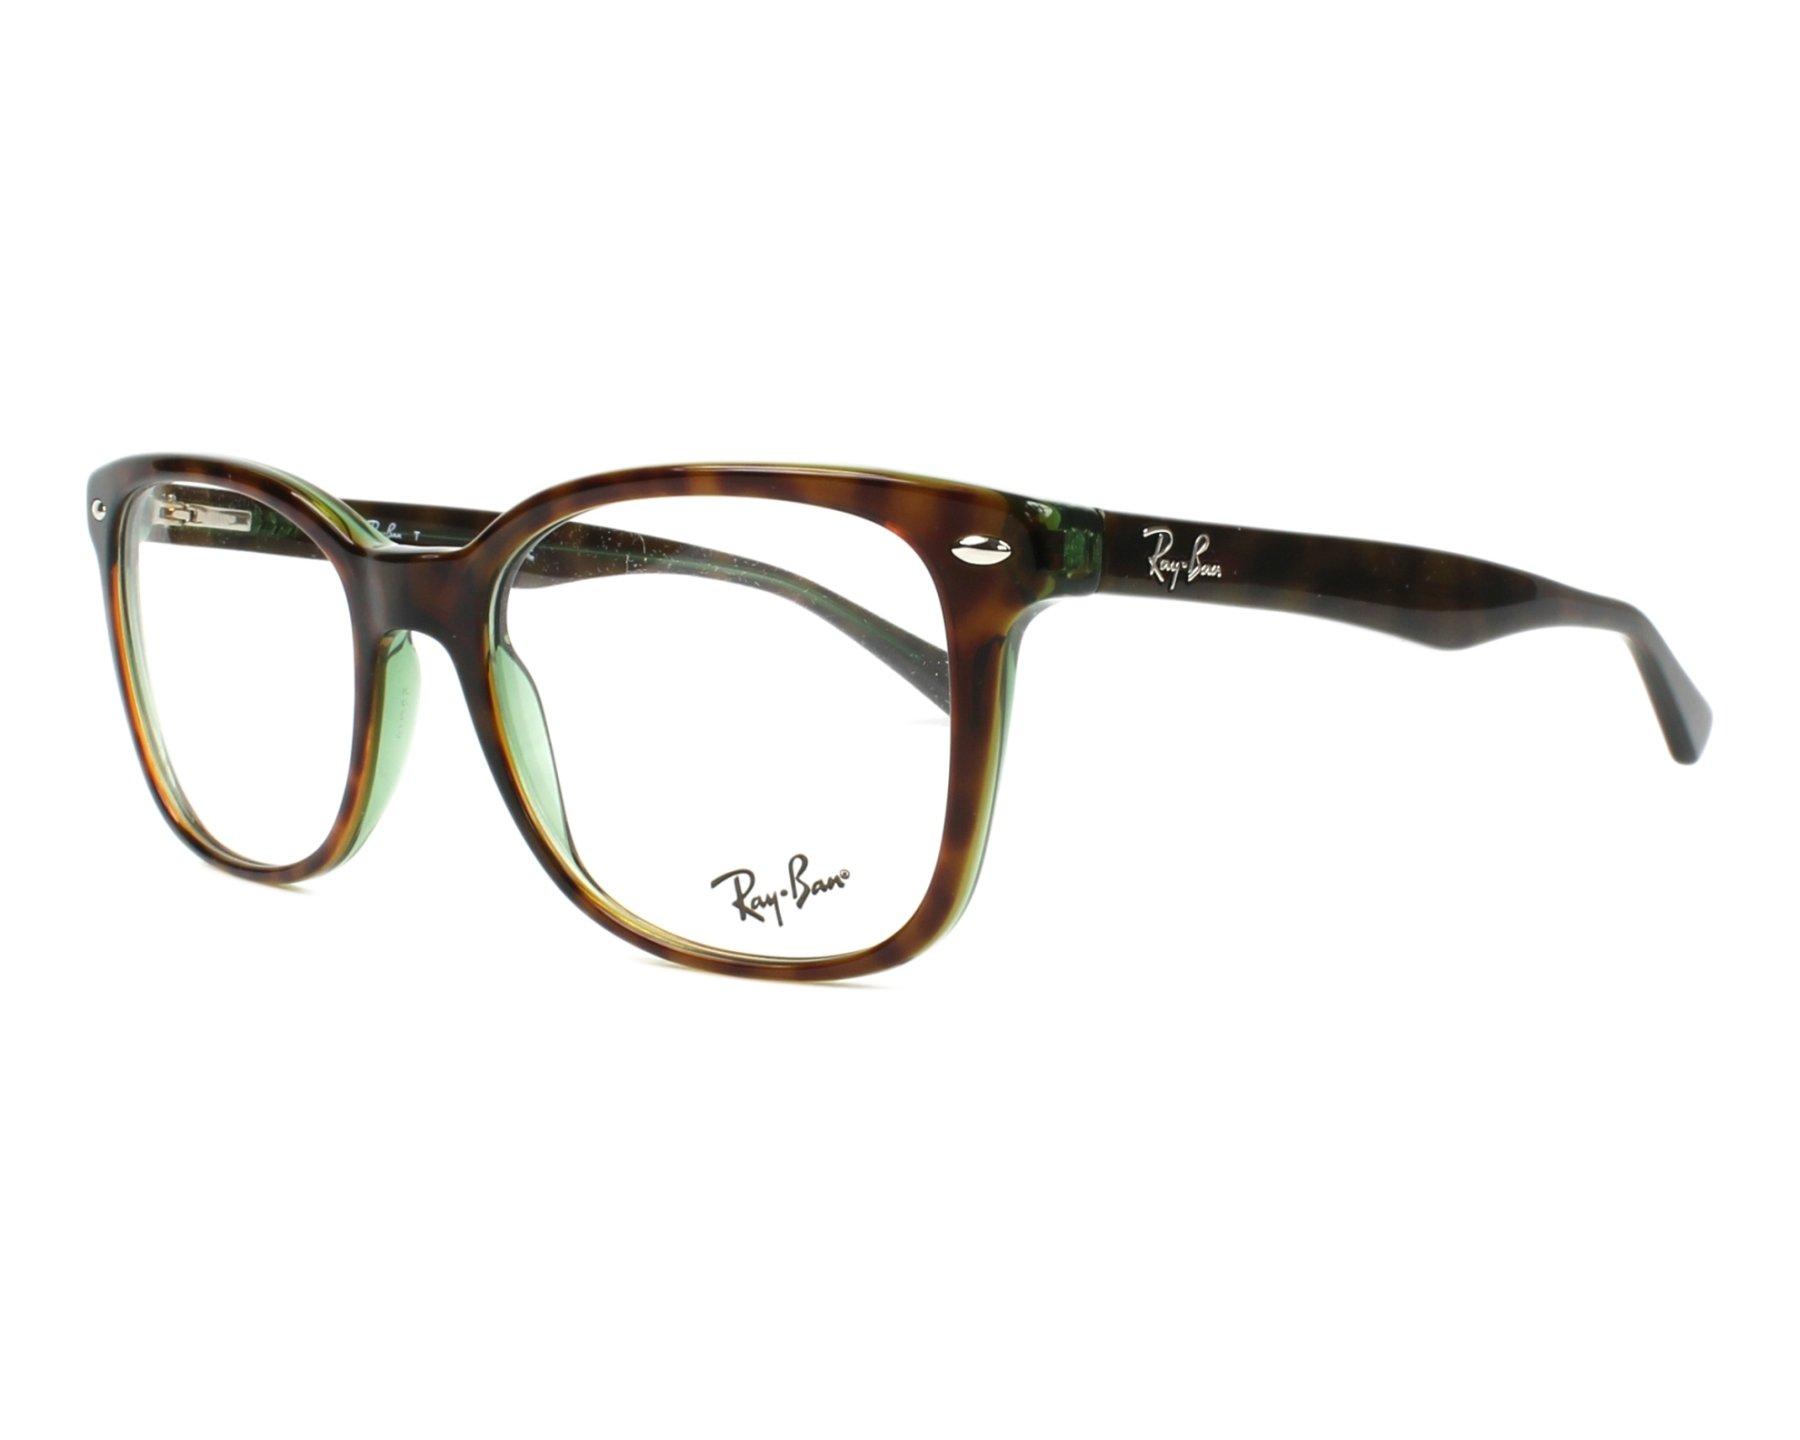 38aed3f787f eyeglasses Ray-Ban RX-5285 2383 53-19 Havana Green profile view